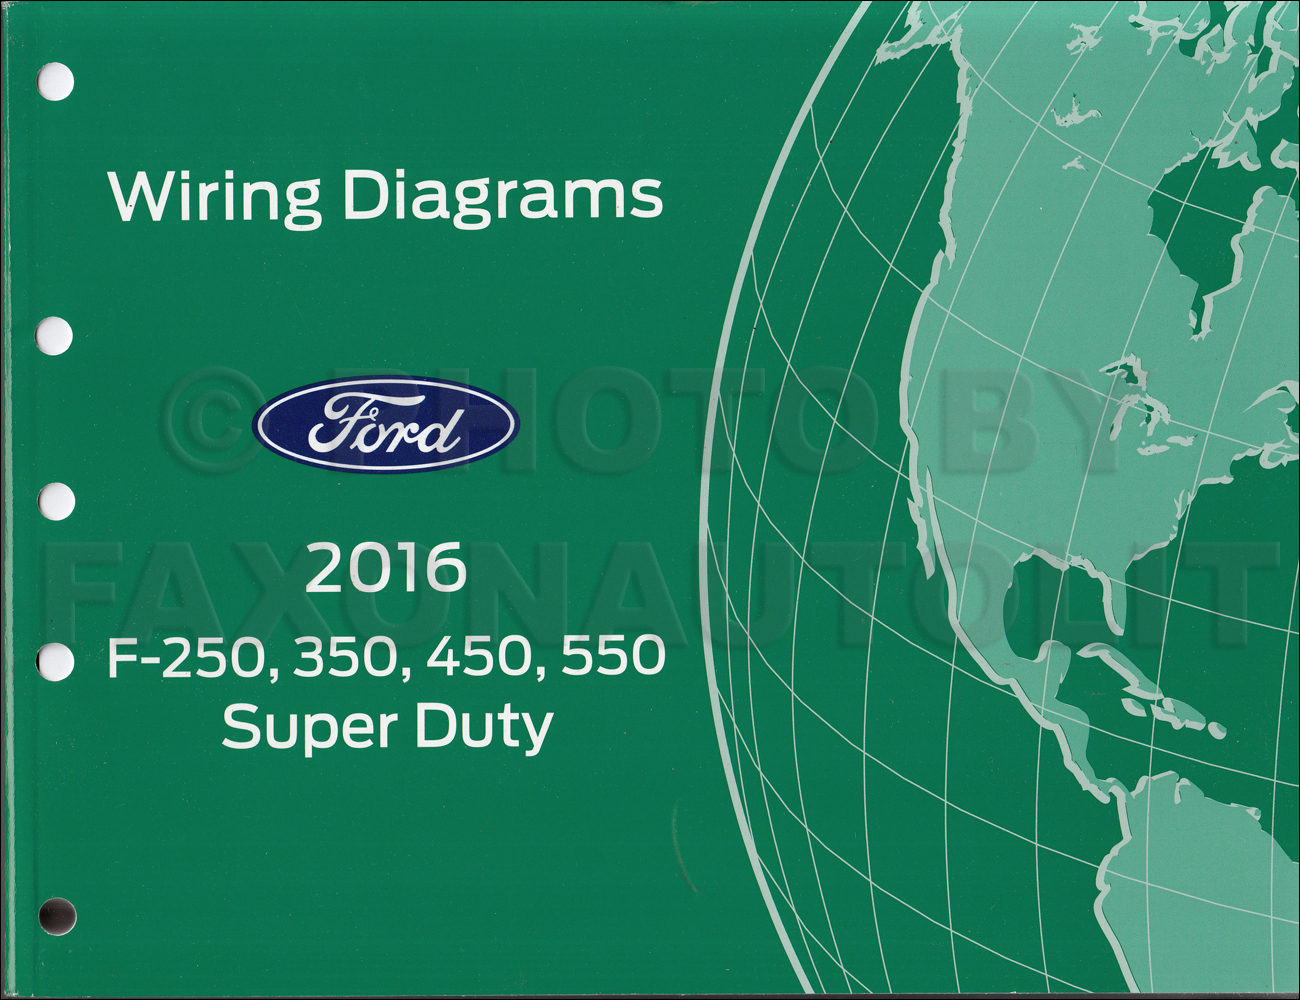 2016 Ford F250-F550 Super Dutytruck Wiring Diagram Manual Original - Ford F250 Wiring Diagram